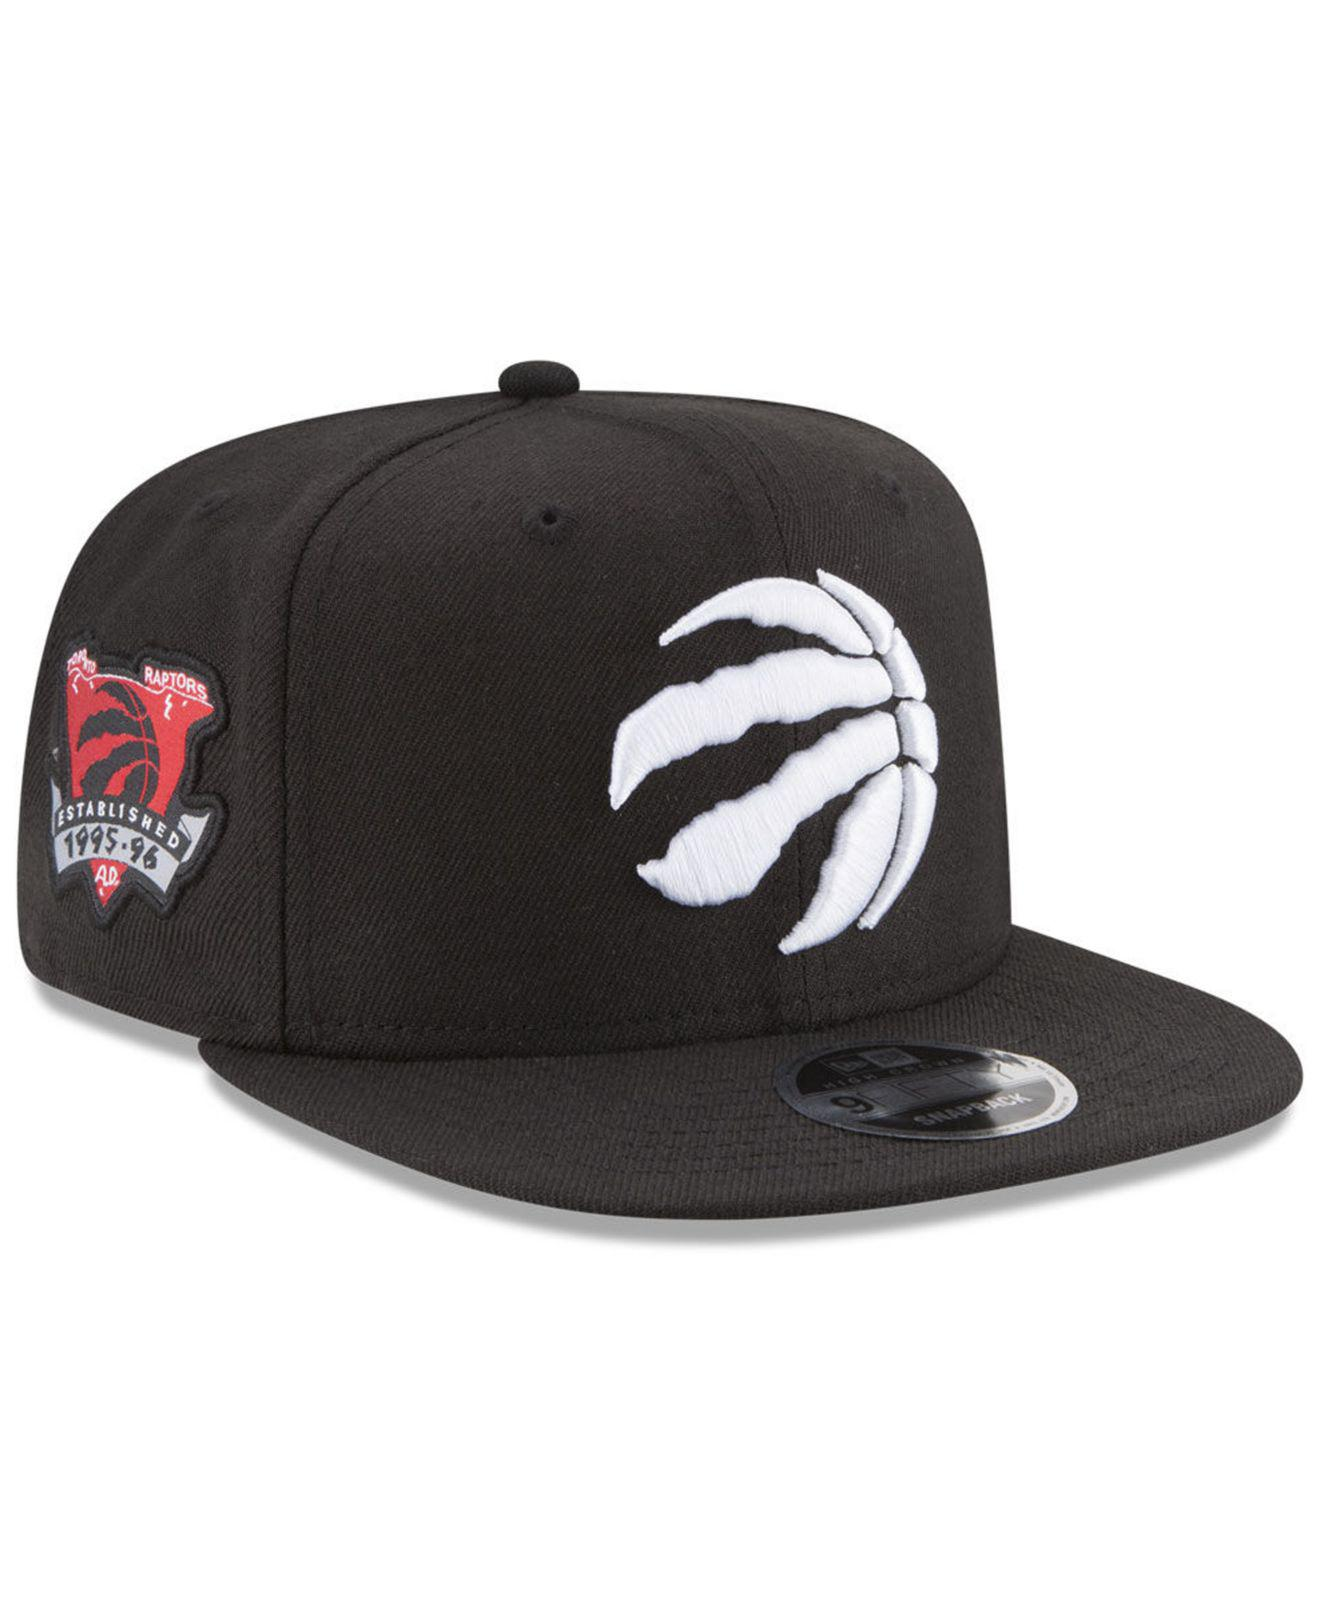 5576f78d73c ... best price ktz black toronto raptors anniversary patch 9fifty snapback  cap for men lyst. view